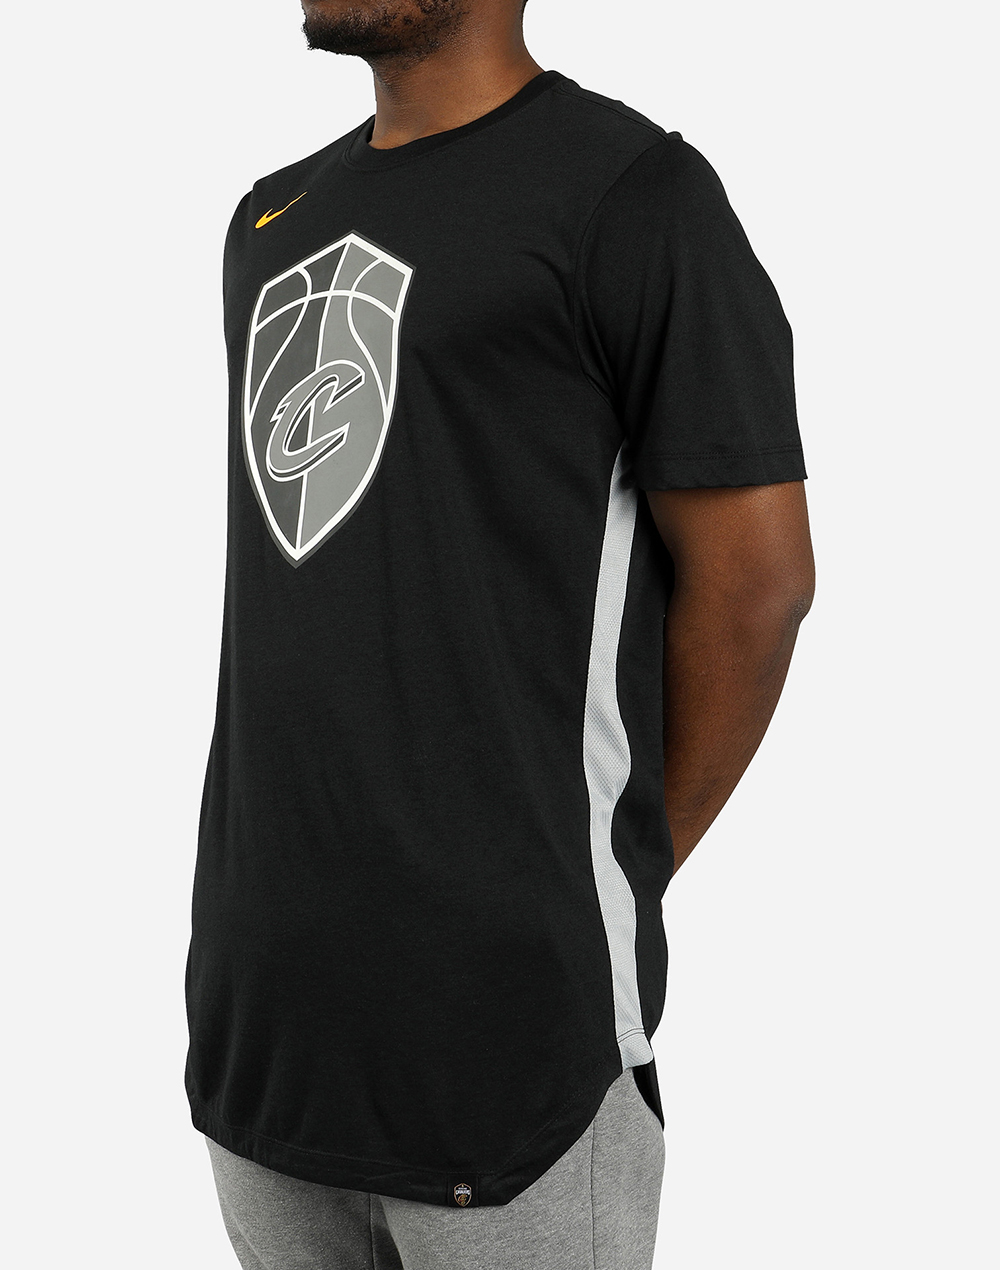 Nike NBA Cleveland Cavaliers City Edition Dri-Fit Tee - NBA Shop ... 08c6ccd7d